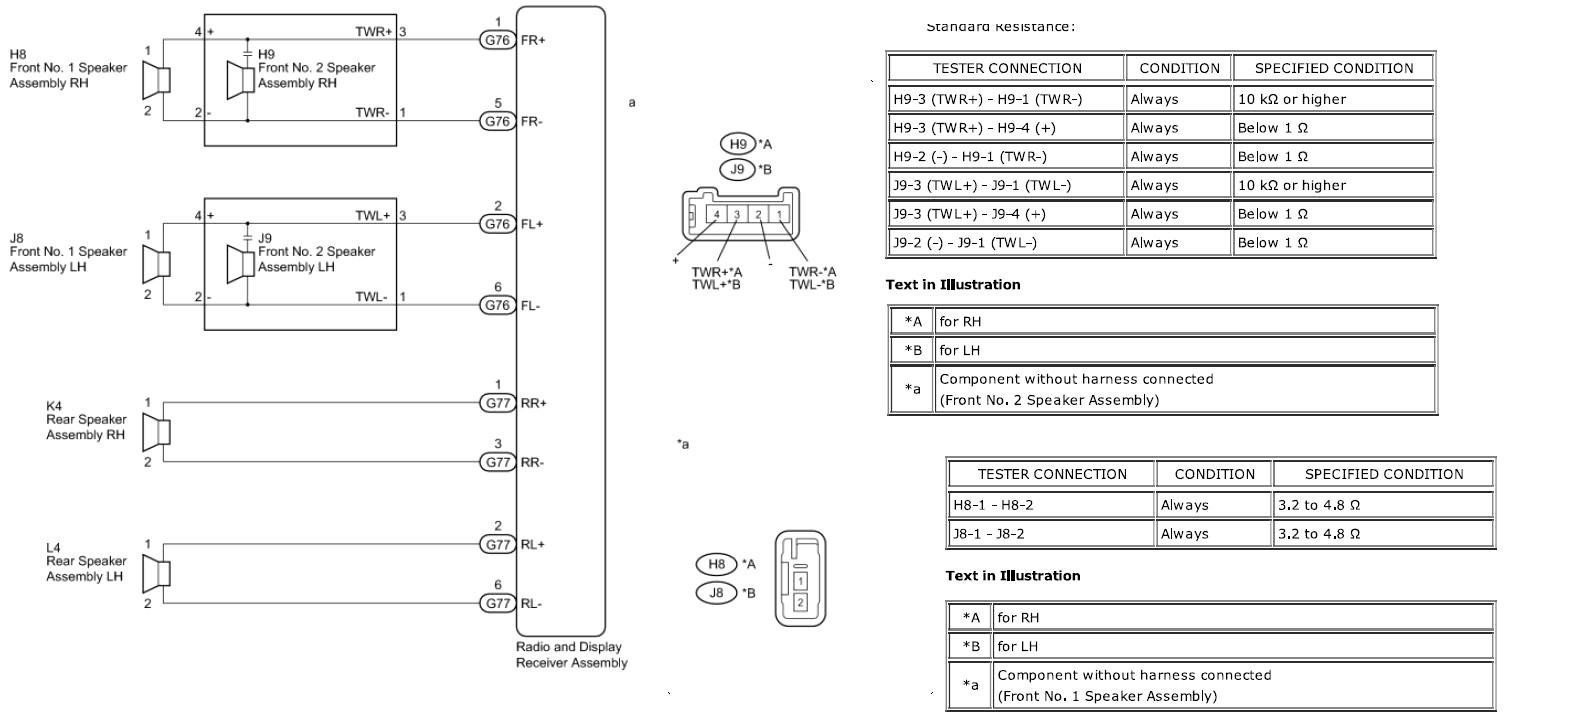 Alpine 445U Wiring Diagram | Wiring Diagram - Alpine Ktp 445U Wiring Diagram